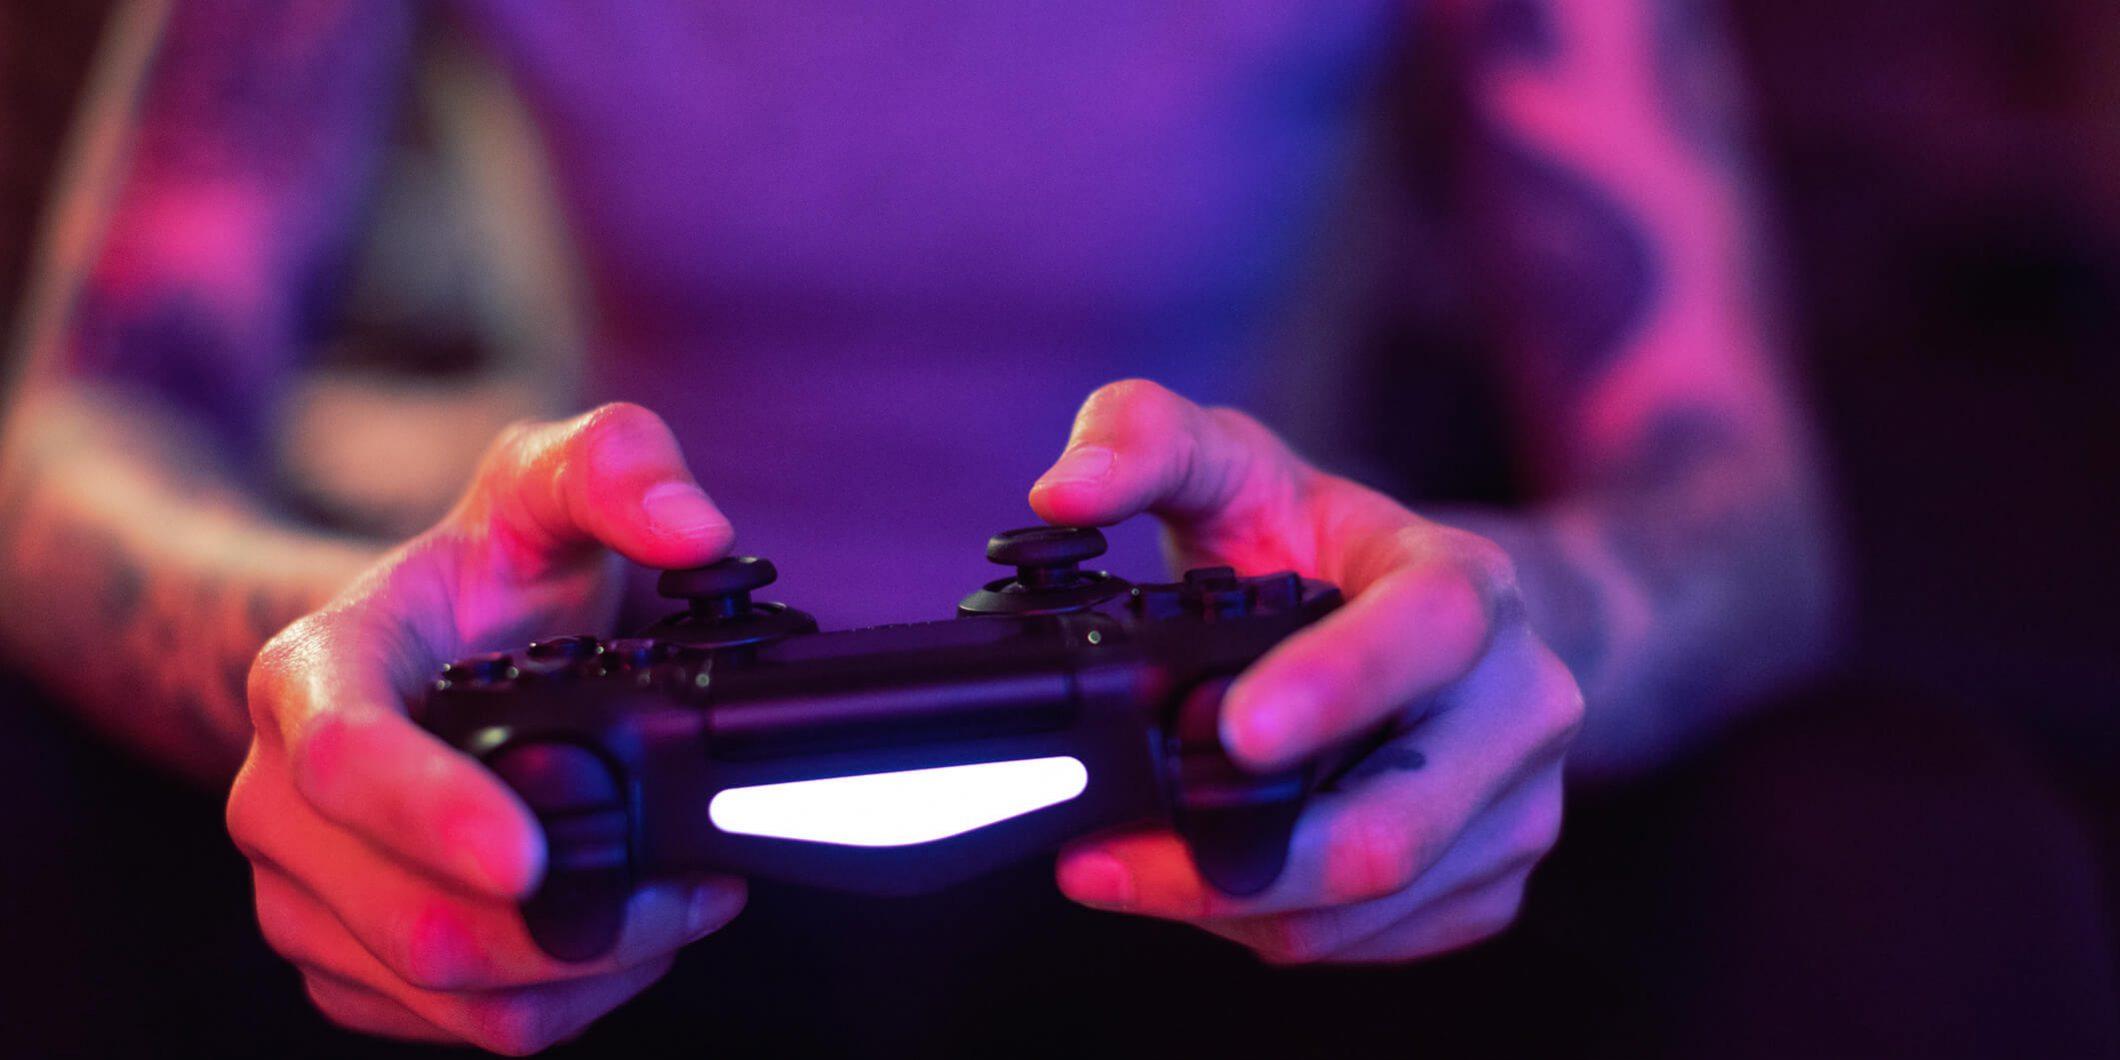 Mercado de games se fortalece em meio a crise